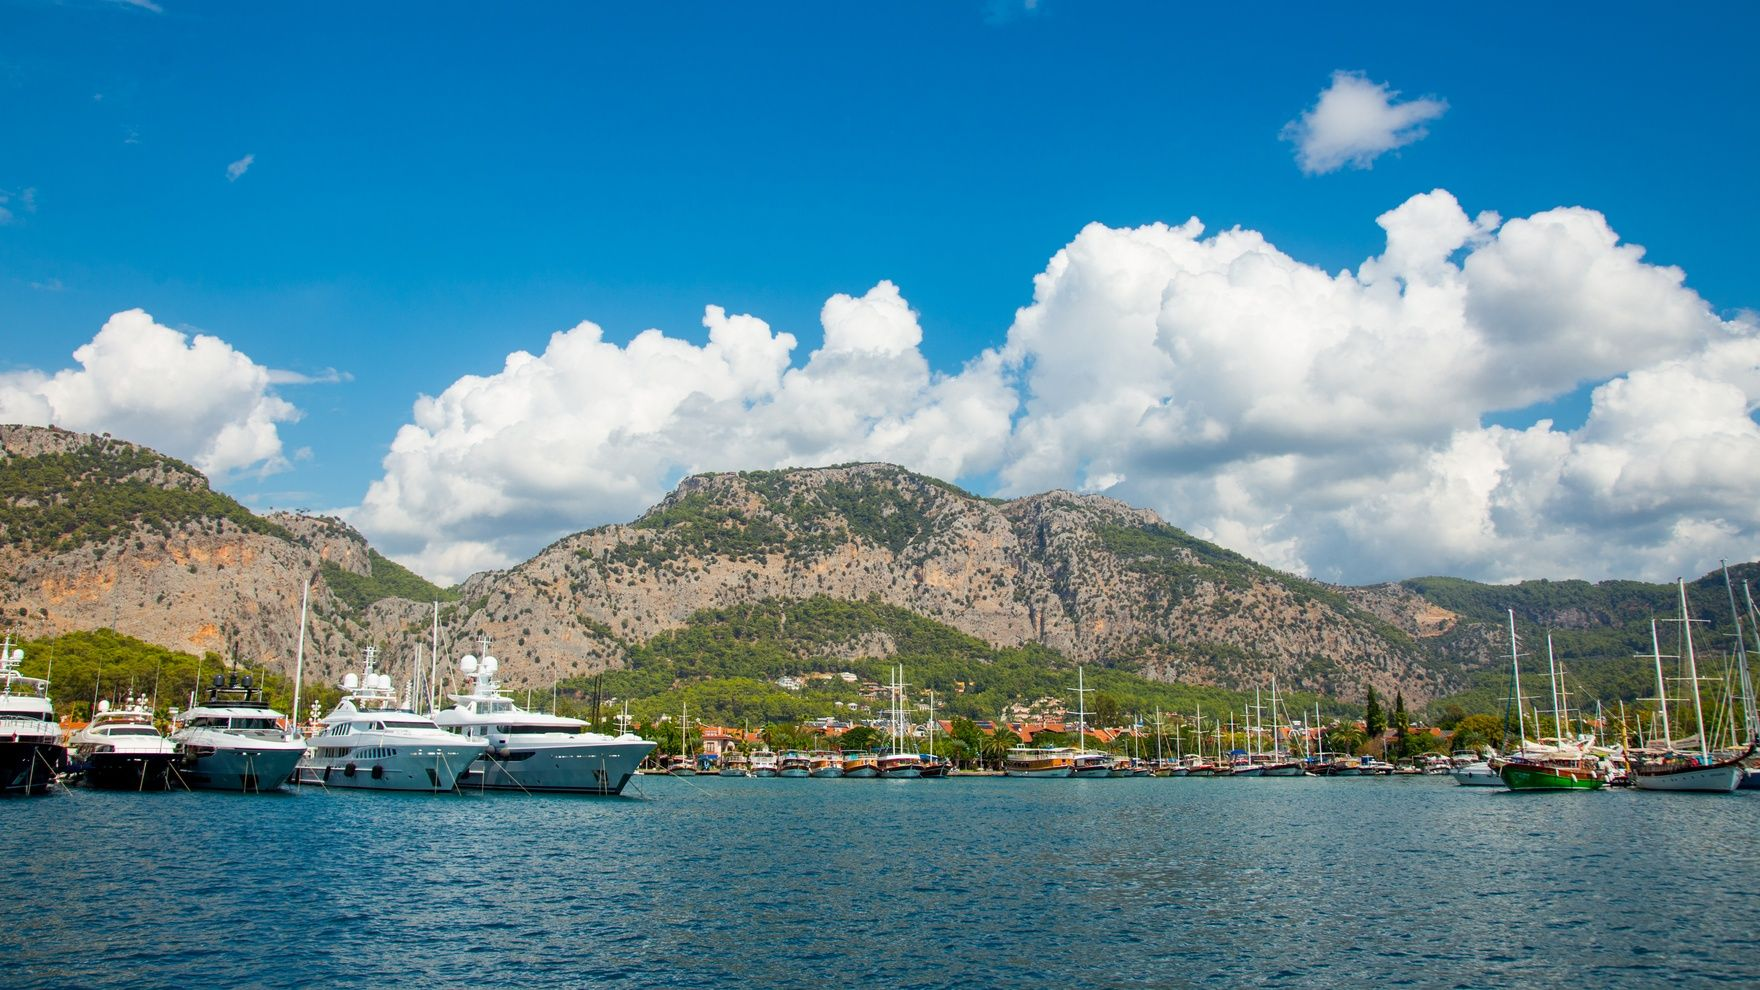 Day sailing in Marmaris, Turkey